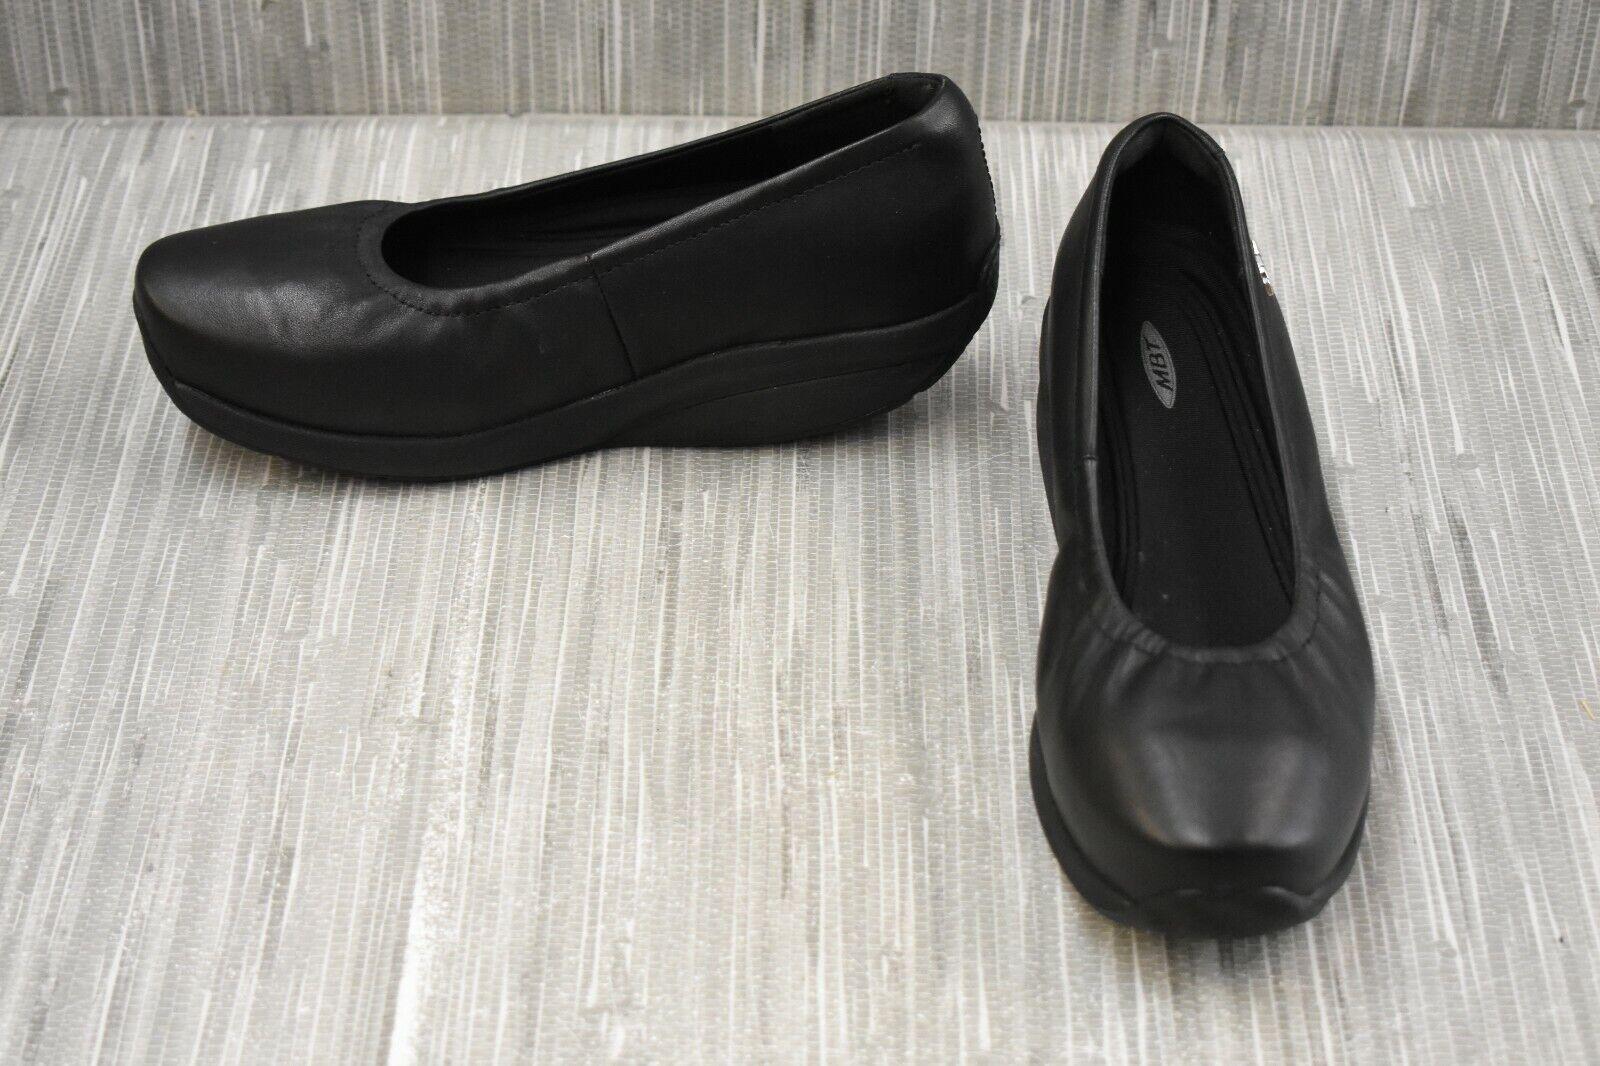 ** MBT Harper 700981-031 À Enfiler Confort Chaussures-Femme taille US:6-6.5, Noir